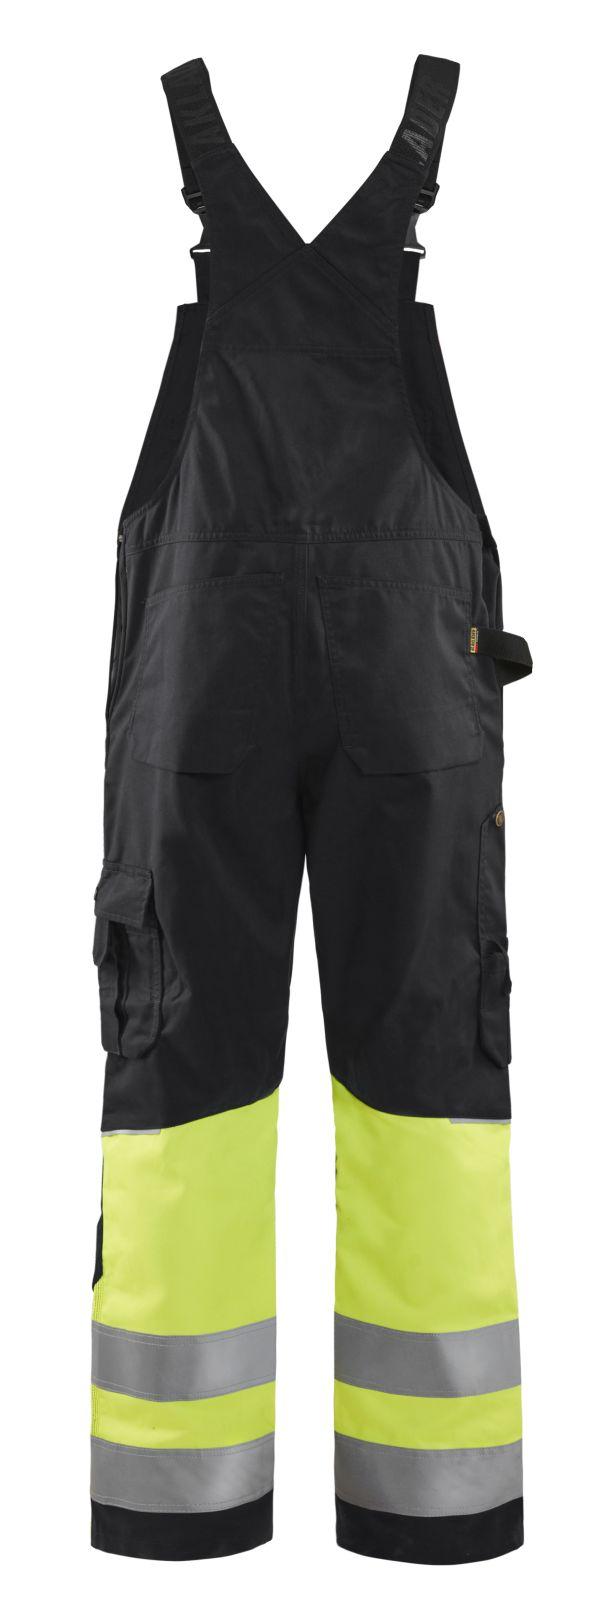 Blaklader Am. Overalls 26621800 High Vis zwart-fluo geel(9933)